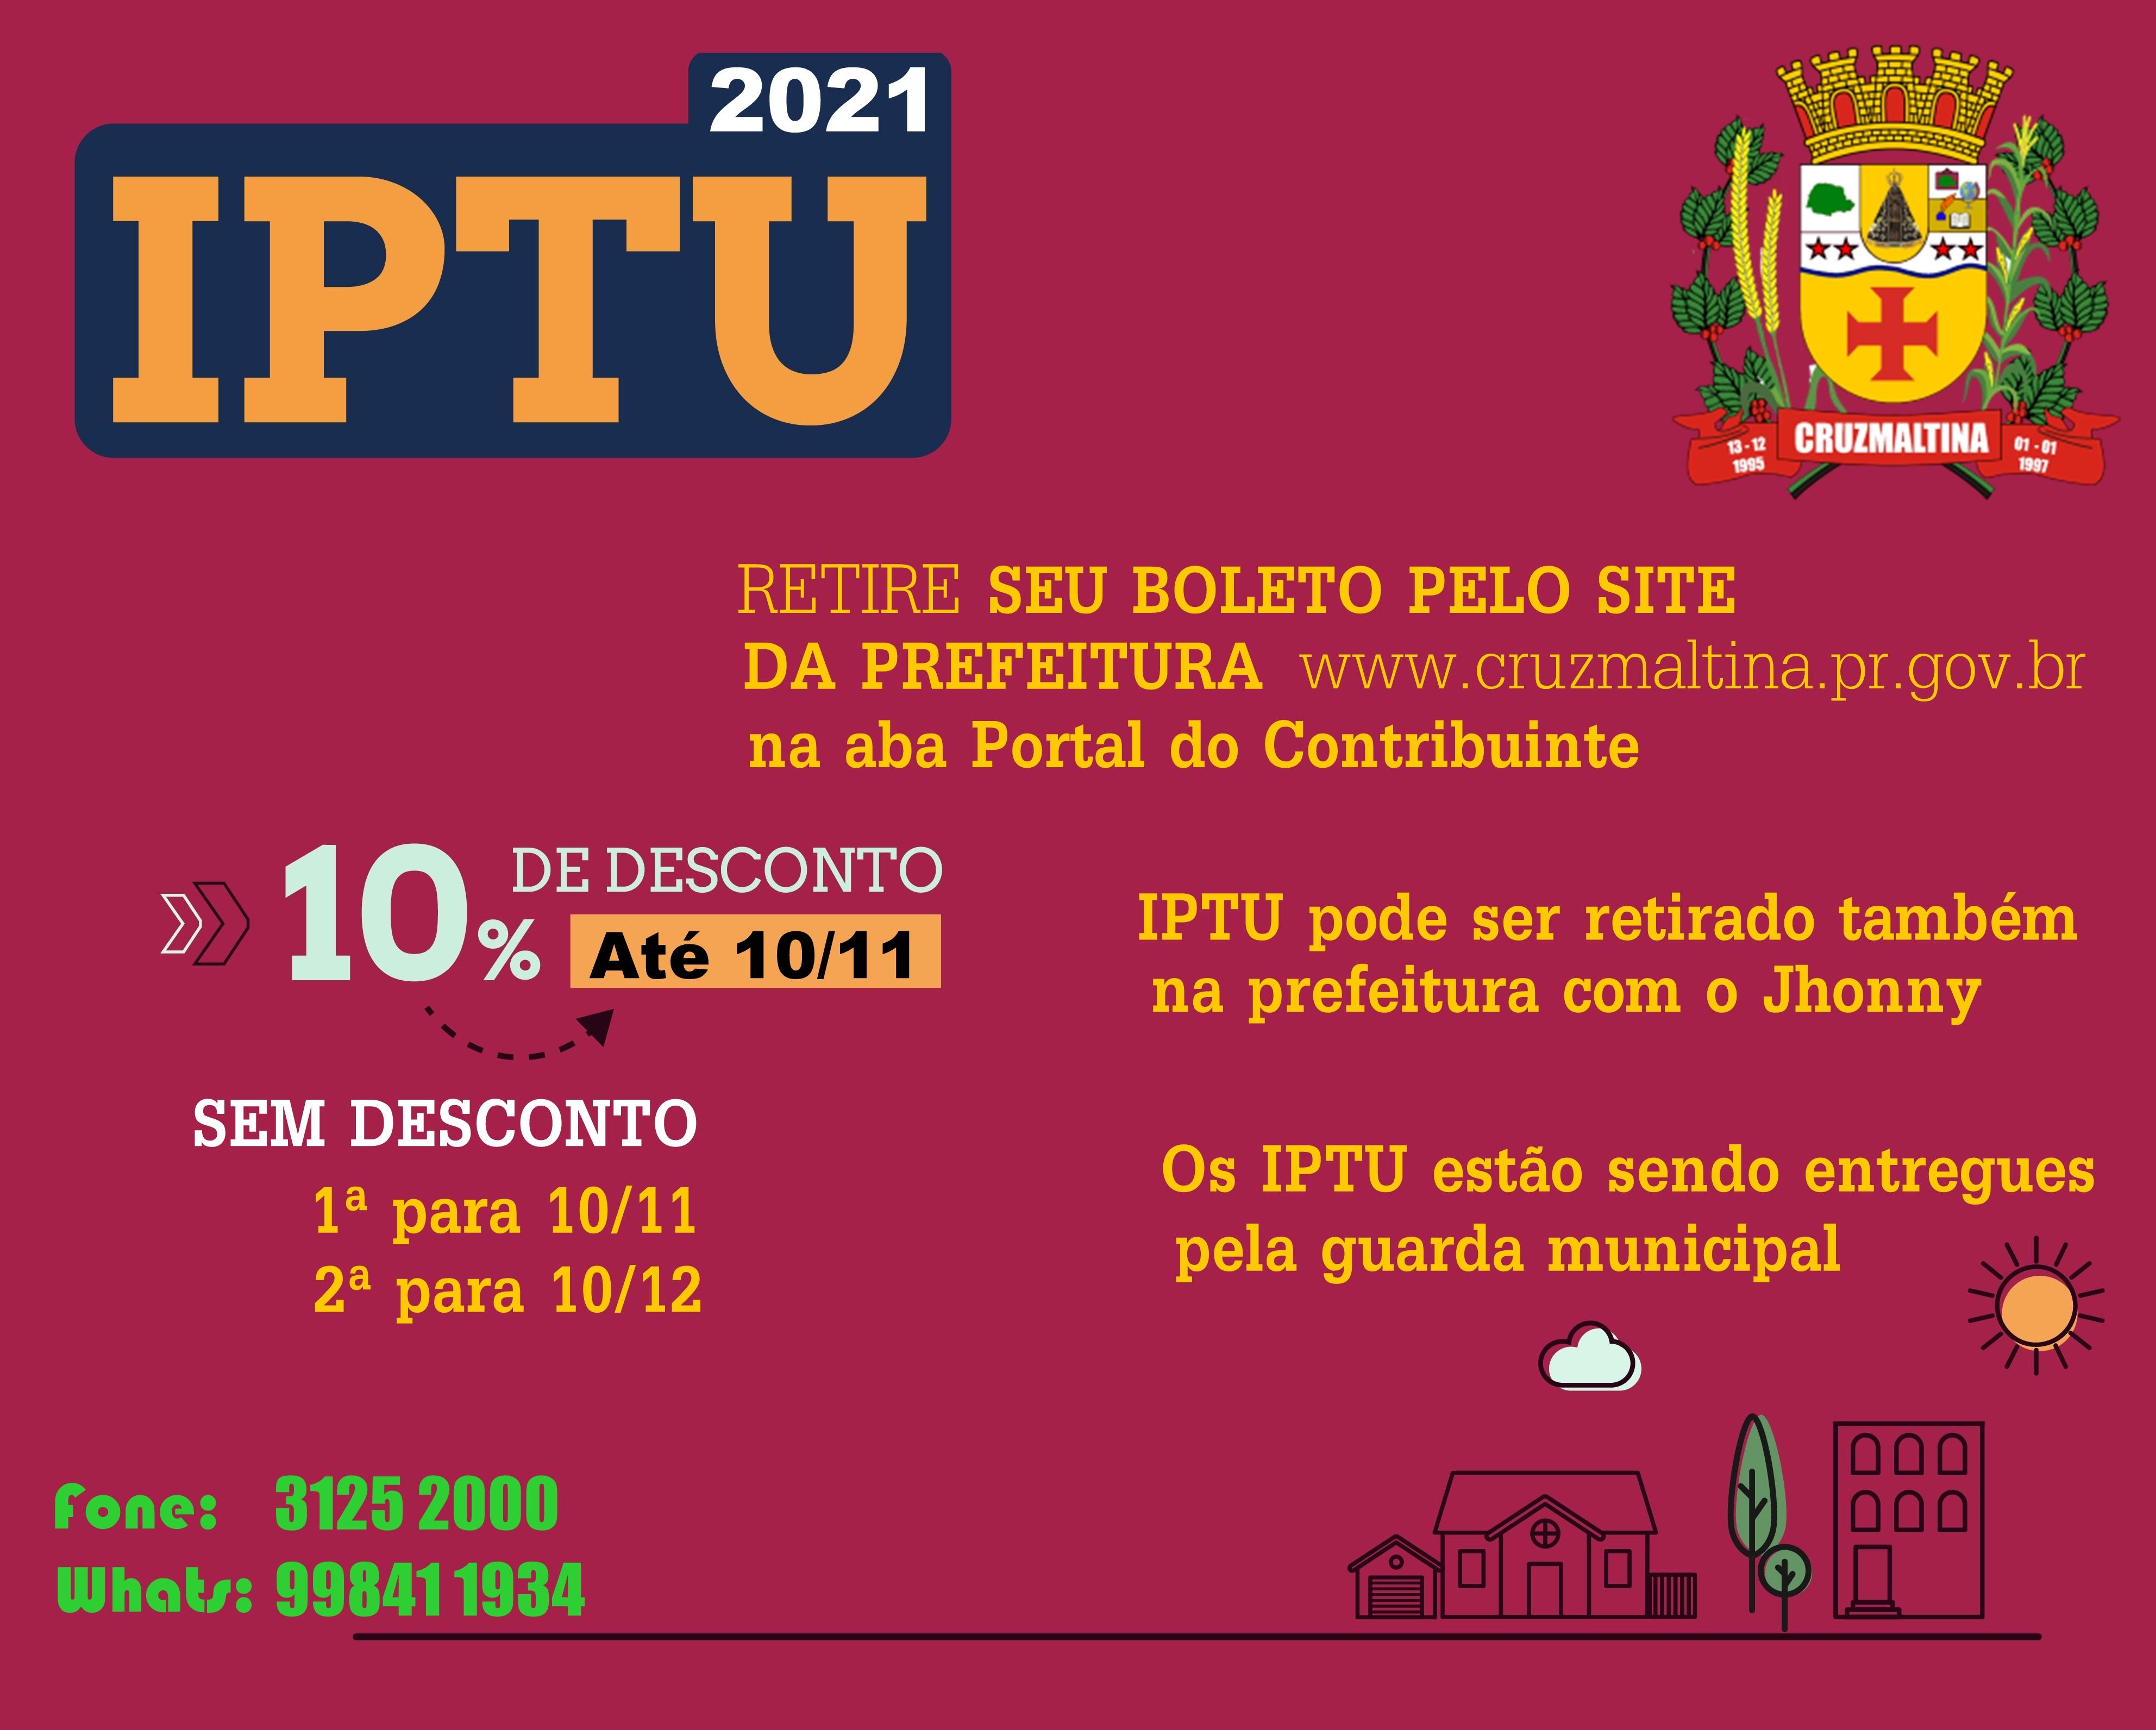 CRUZMALTINA - IPTU disponível para pagamento